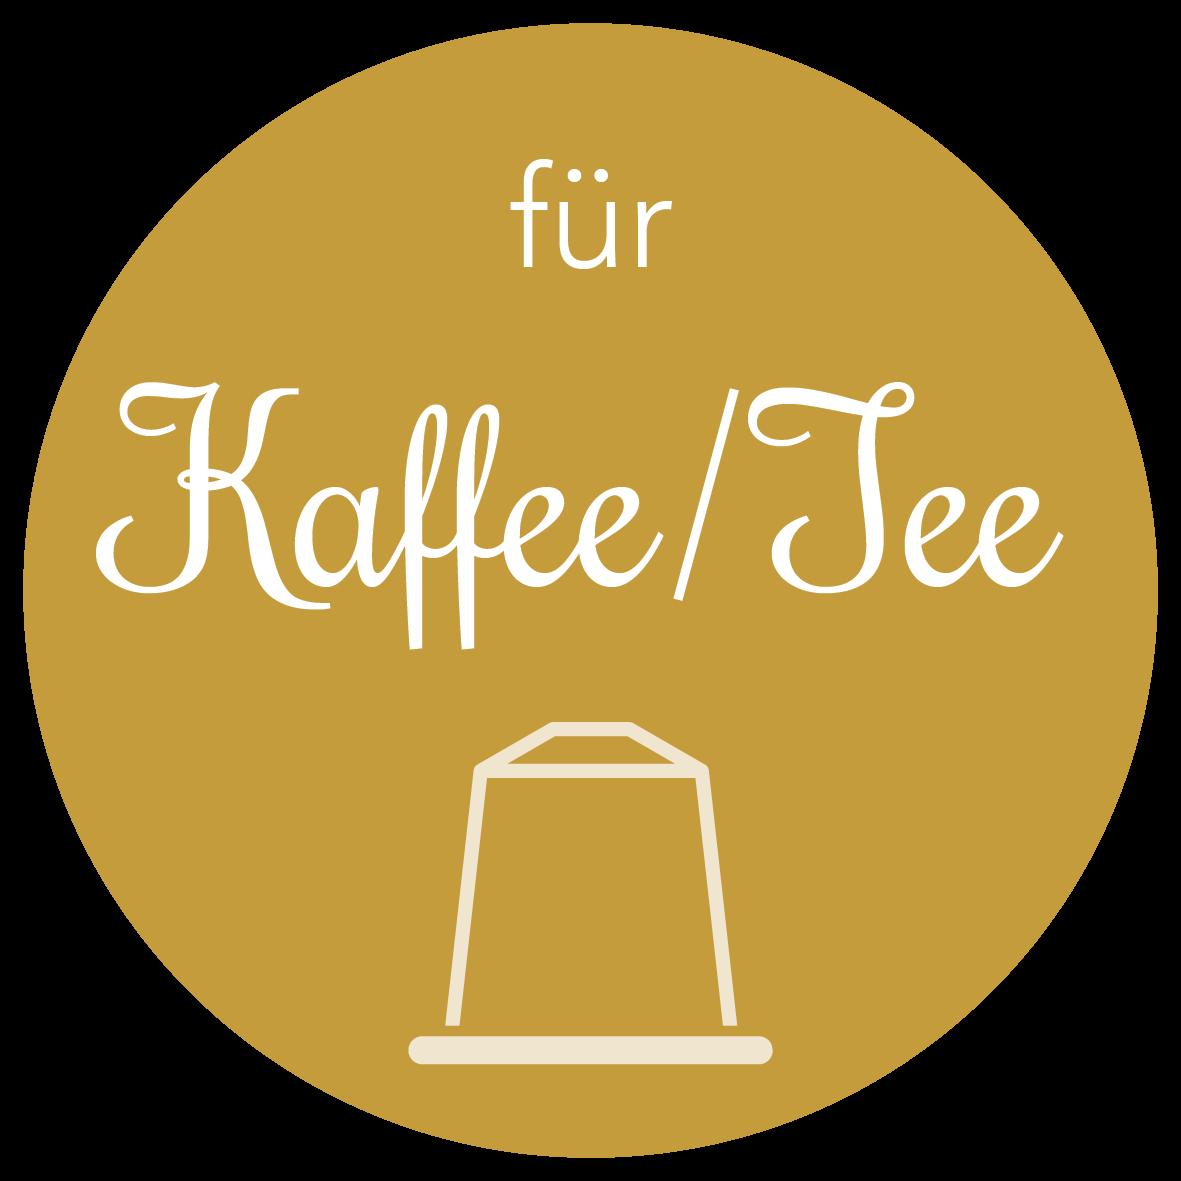 Adventskalender für Kaffee/Tee